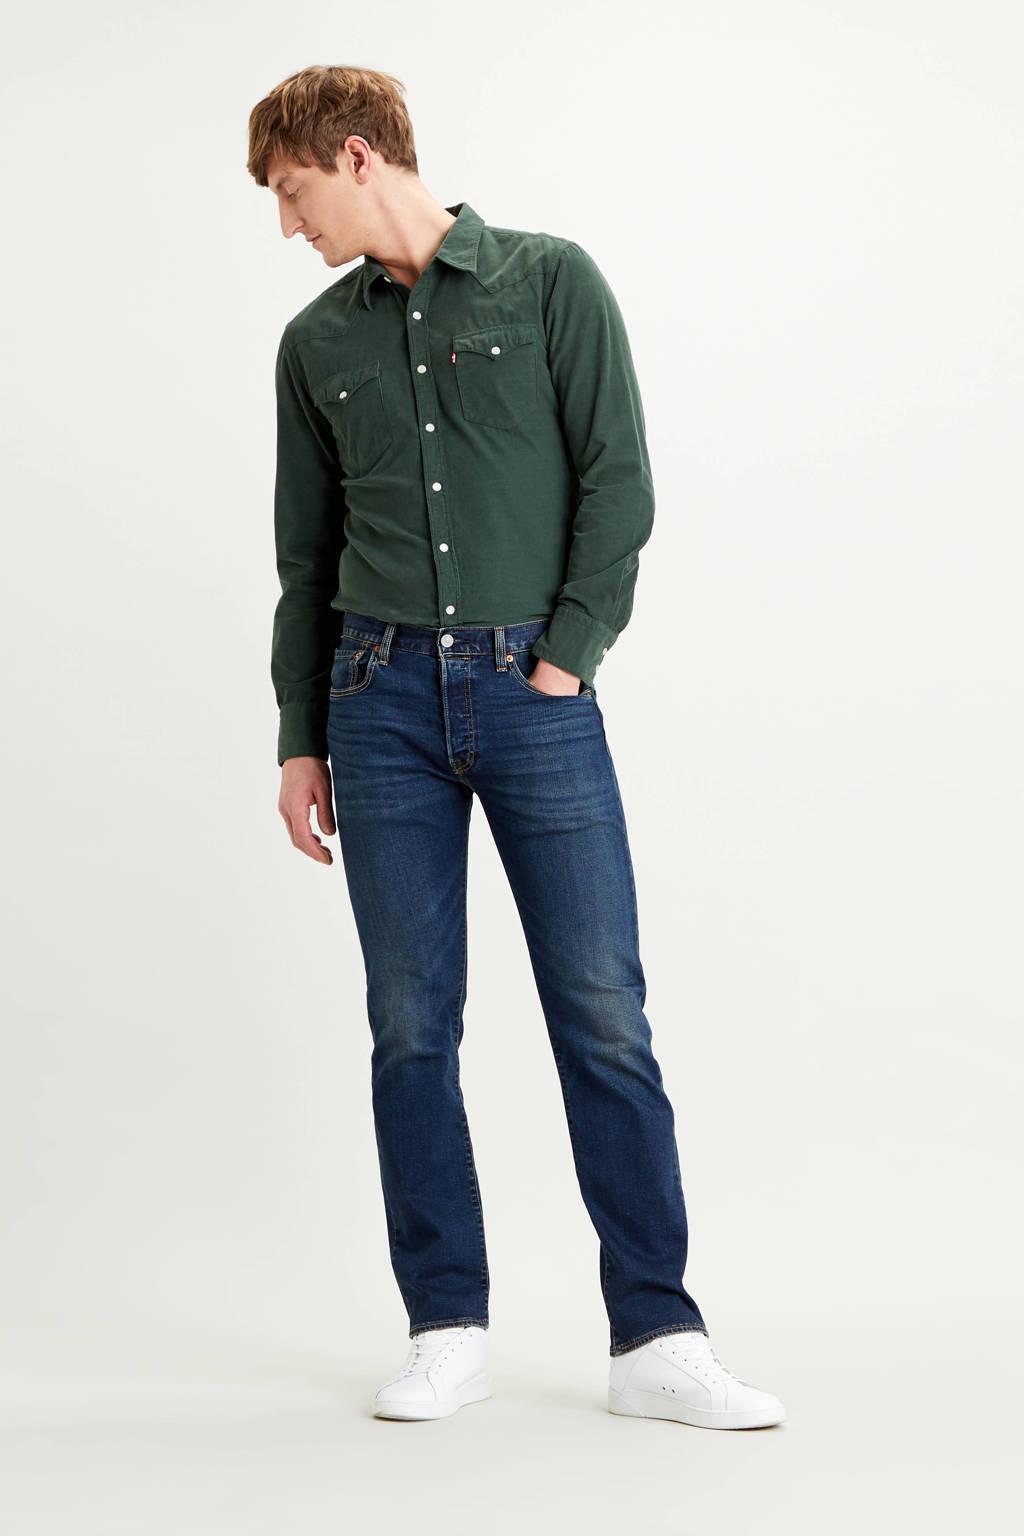 Levi's 501 regular fit jeans block crusher, Block Crusher